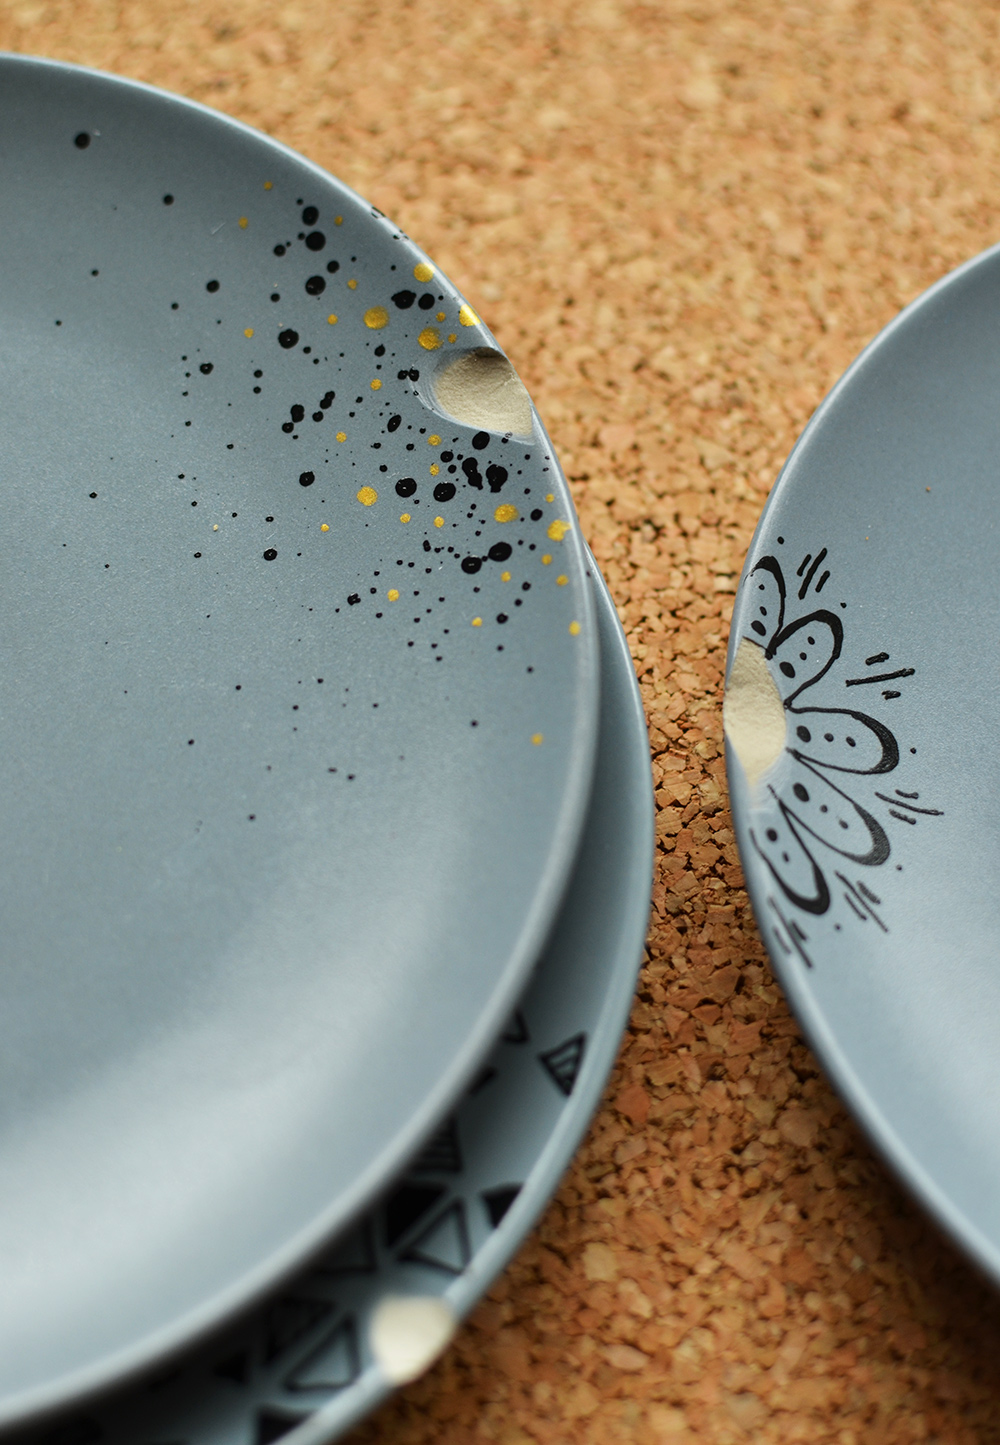 Teller mit Macken aufhübschen, Keramik-Upcycling